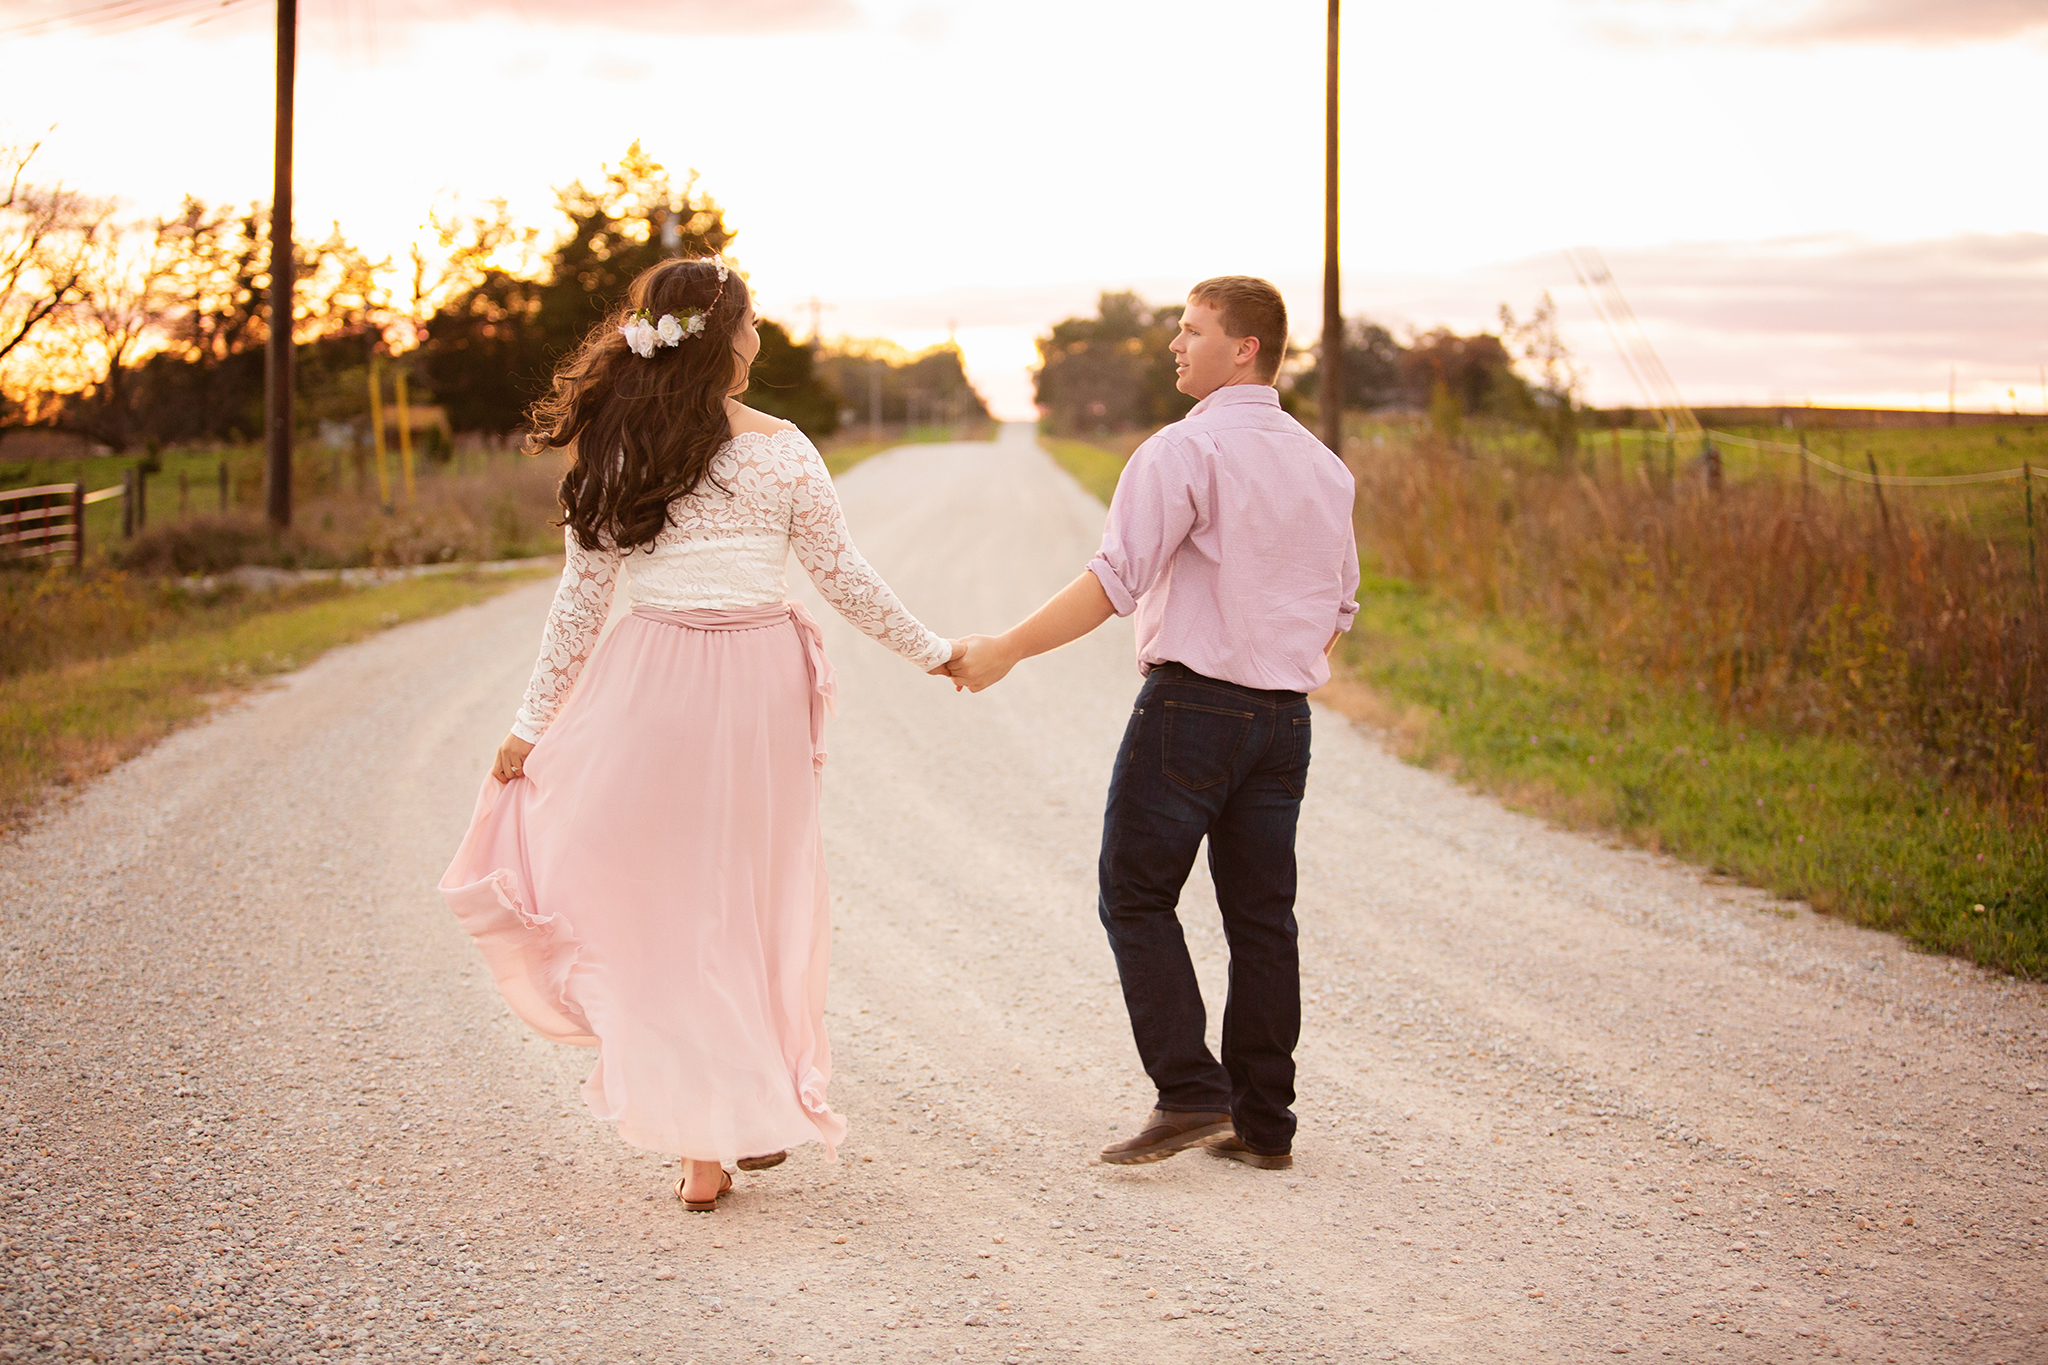 lehia erger photography engagement  wedding cedar rapids iowa country.jpg